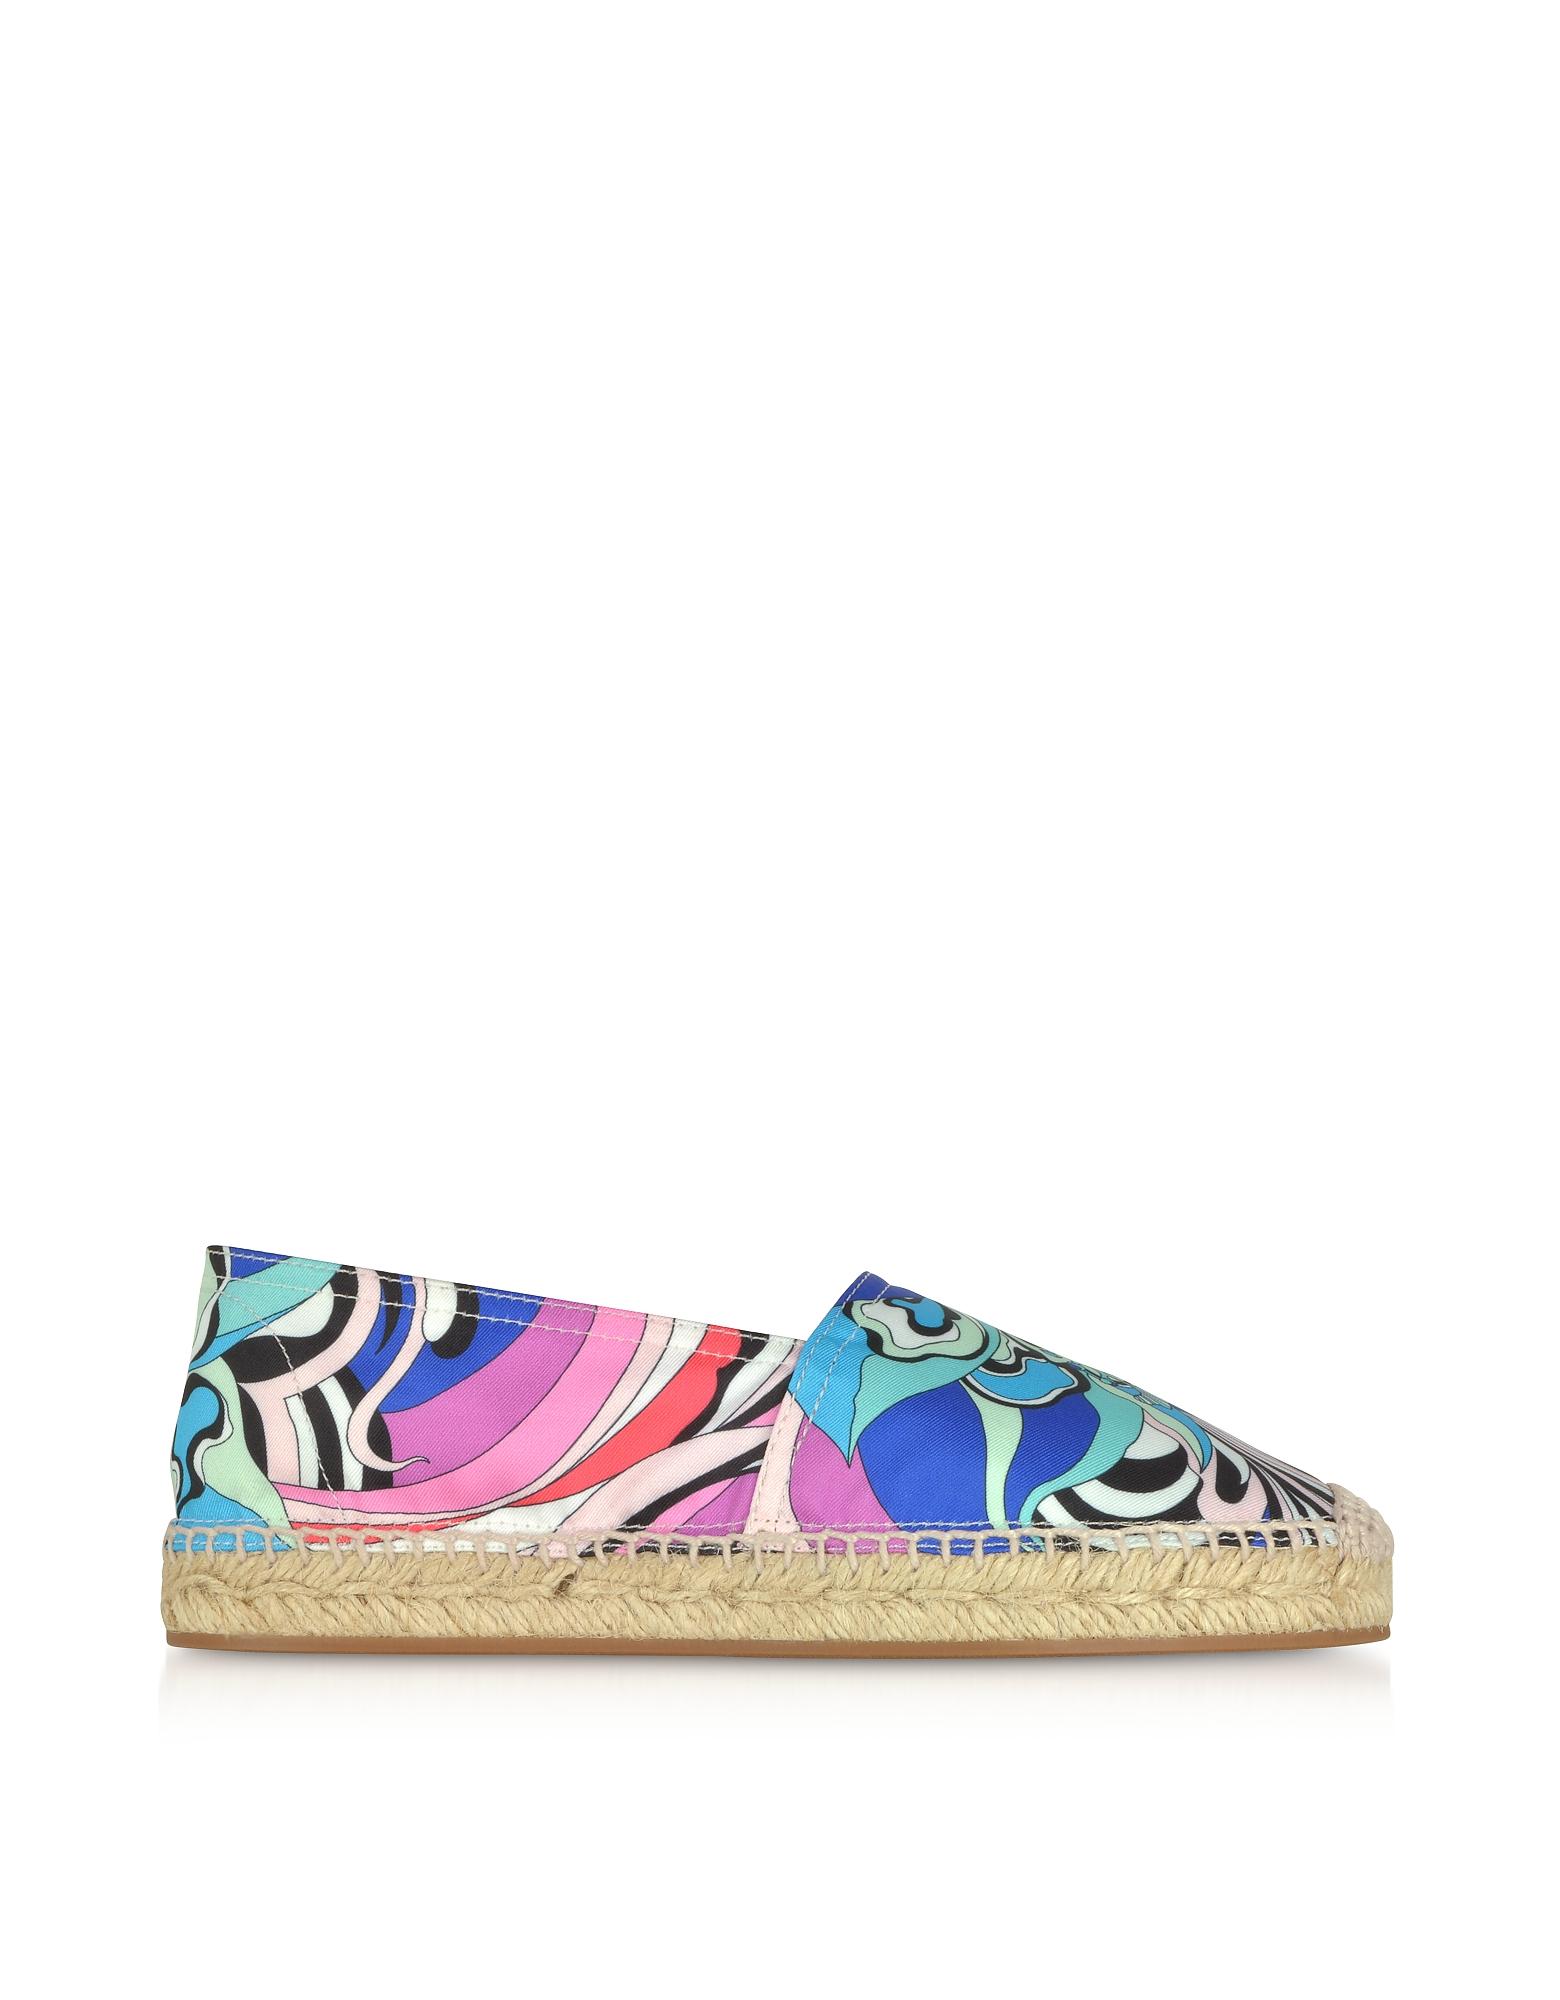 Emilio Pucci Shoes, Multicolor Printed Canvas Espadrilles